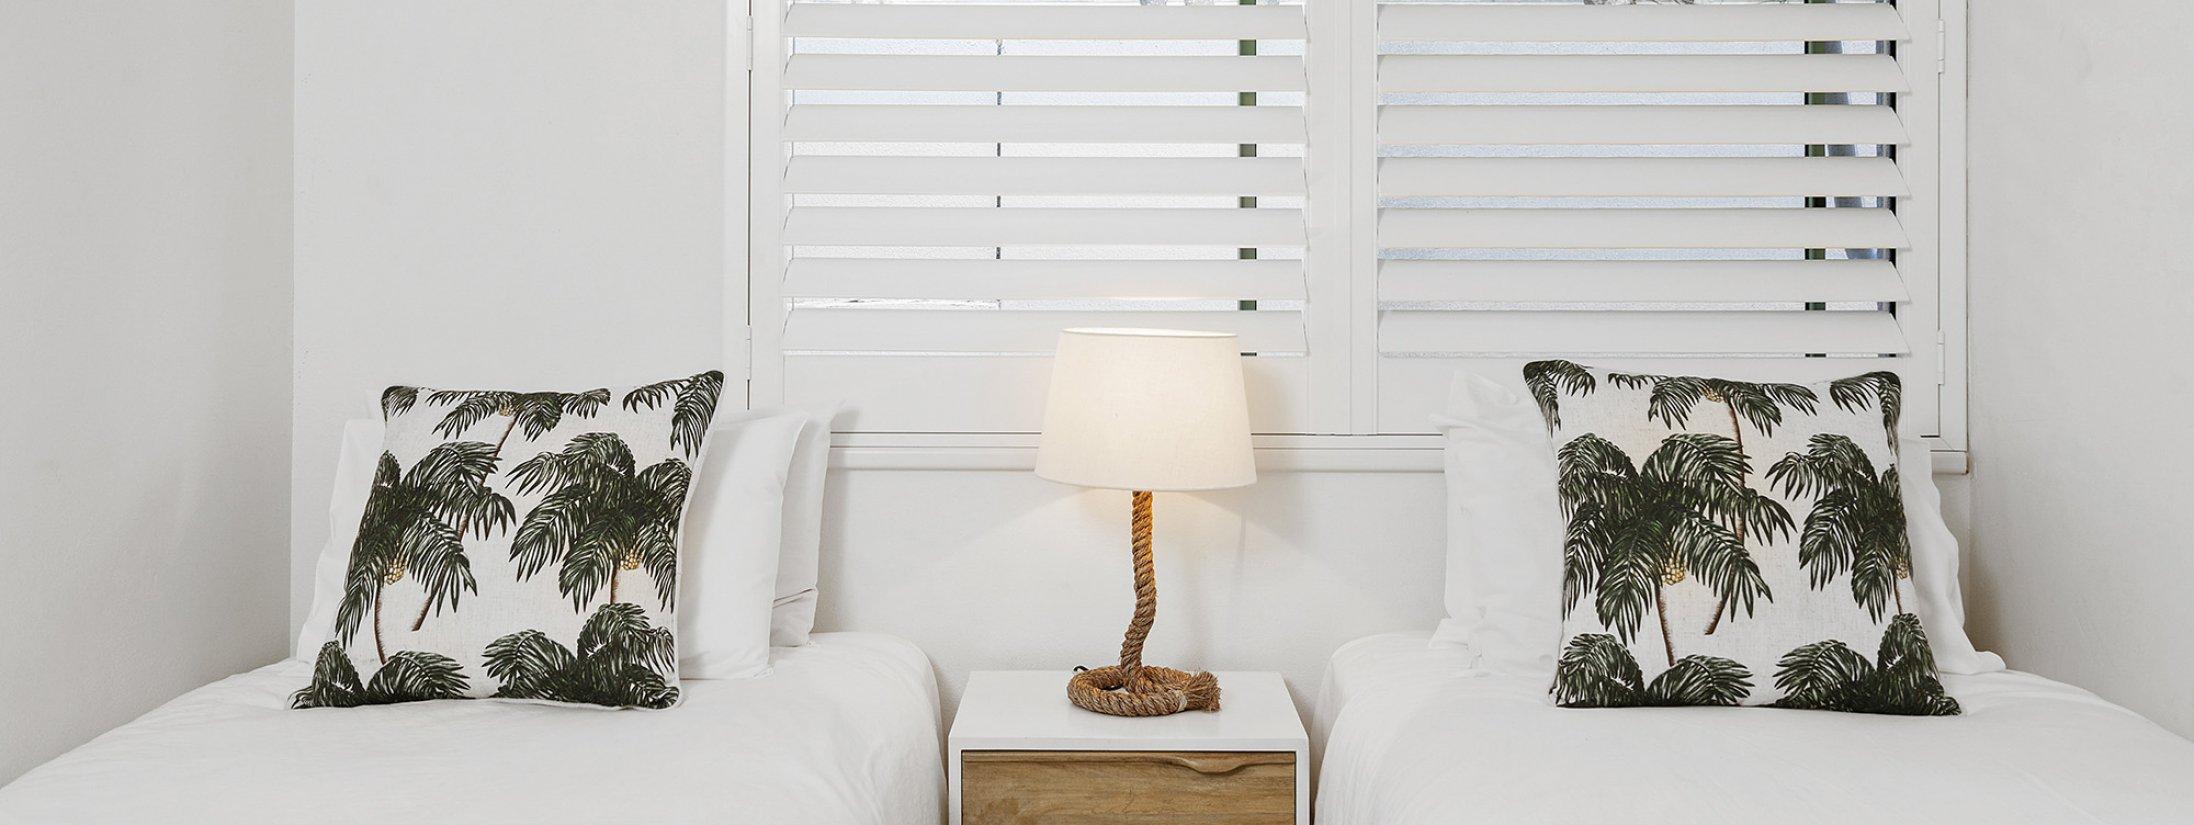 Apartment 1 Surfside - Byron Bay - Bedroom 3